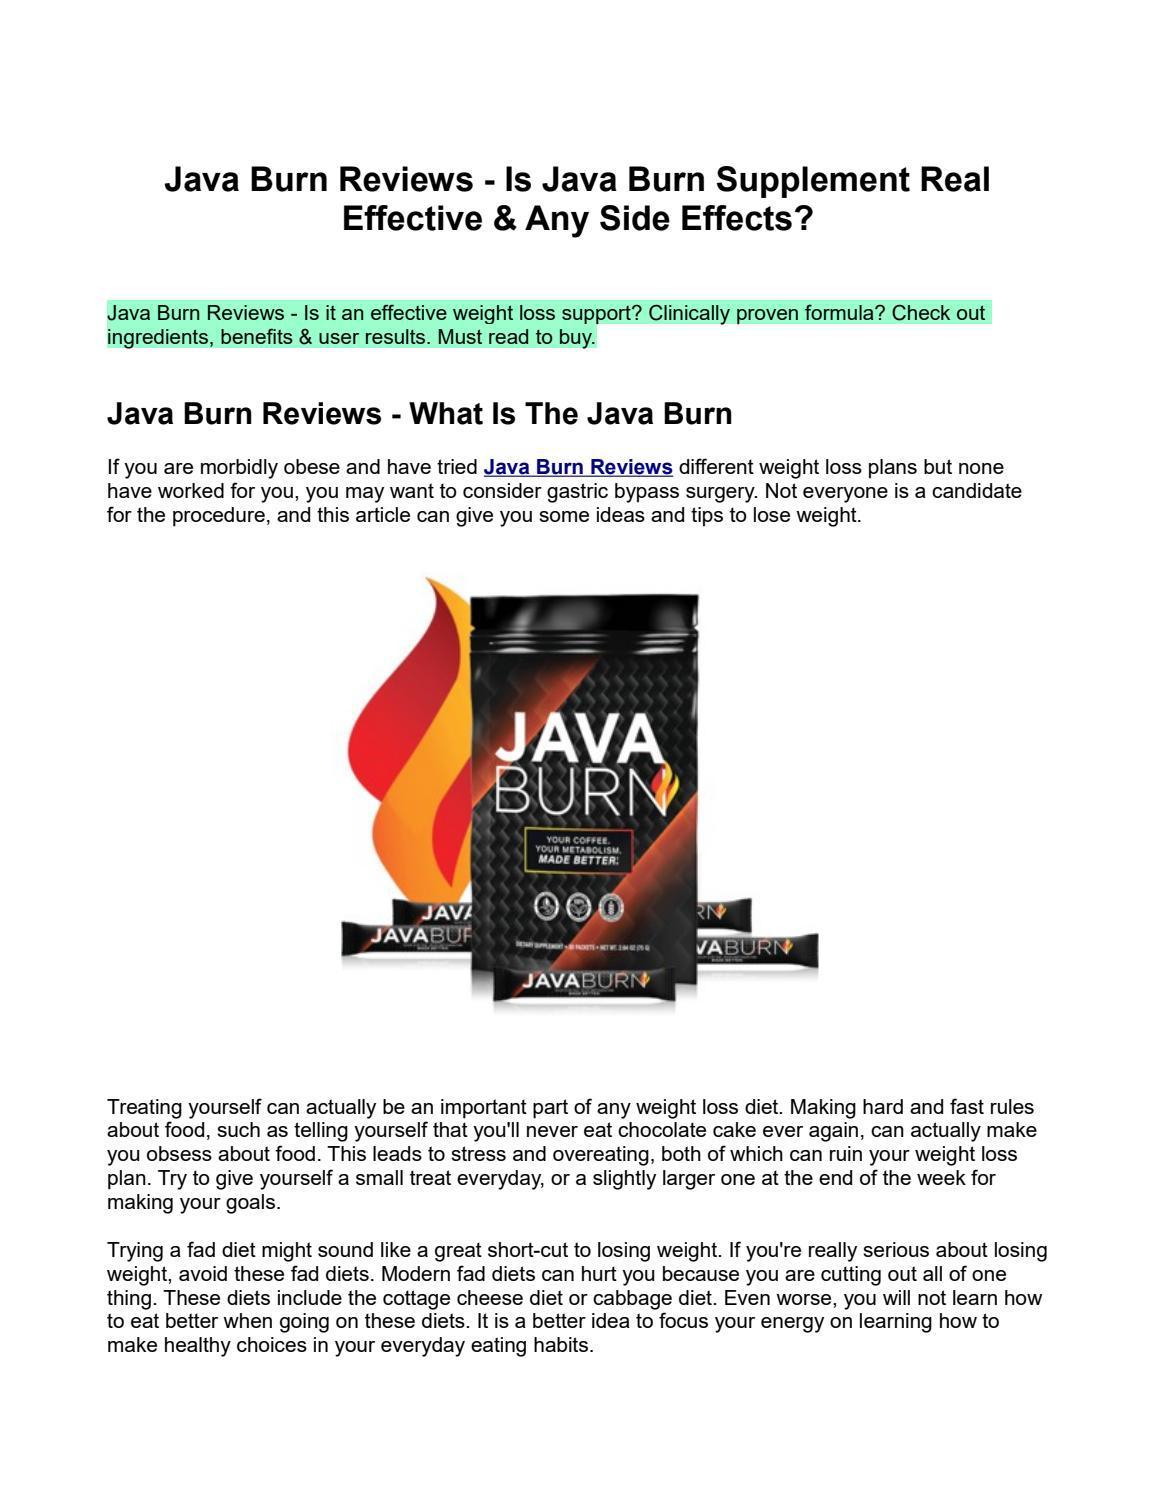 JAVA BURN - Java Burn Review - BE CAREFUL - Does Java Burn Work? - Java Burn - YouTube